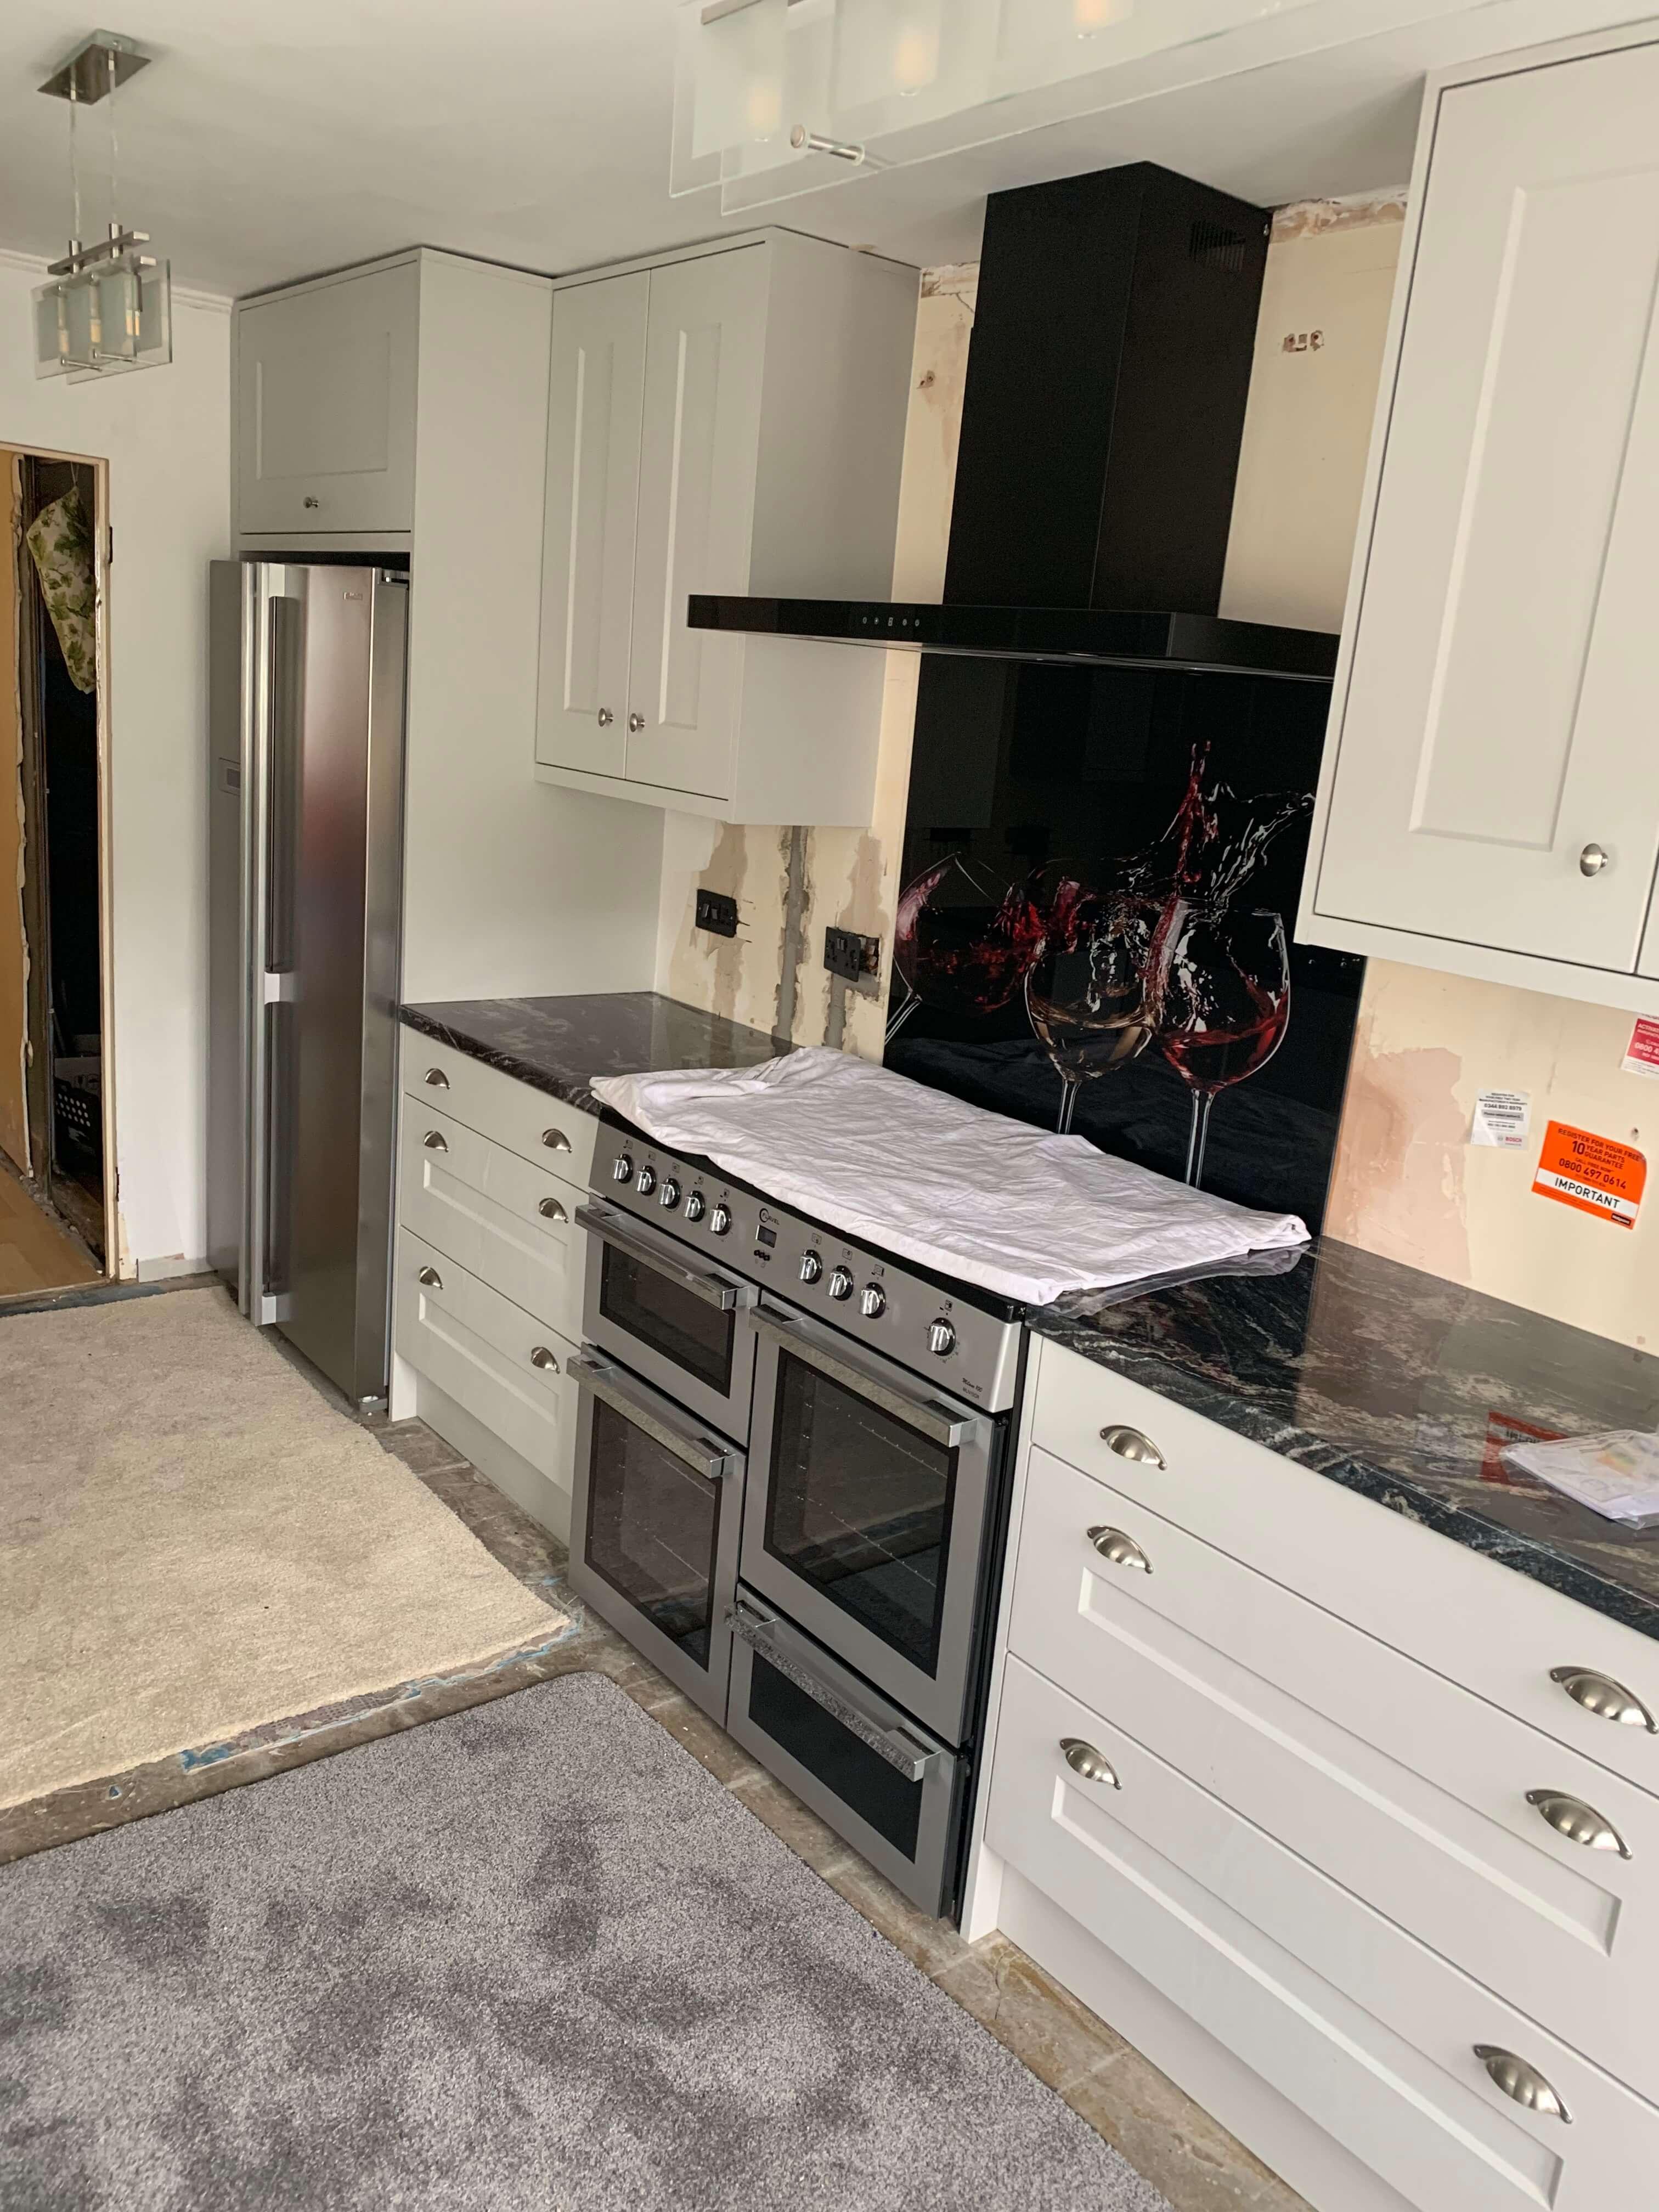 Galley Kitchen for Mr & Mrs T of Bideford